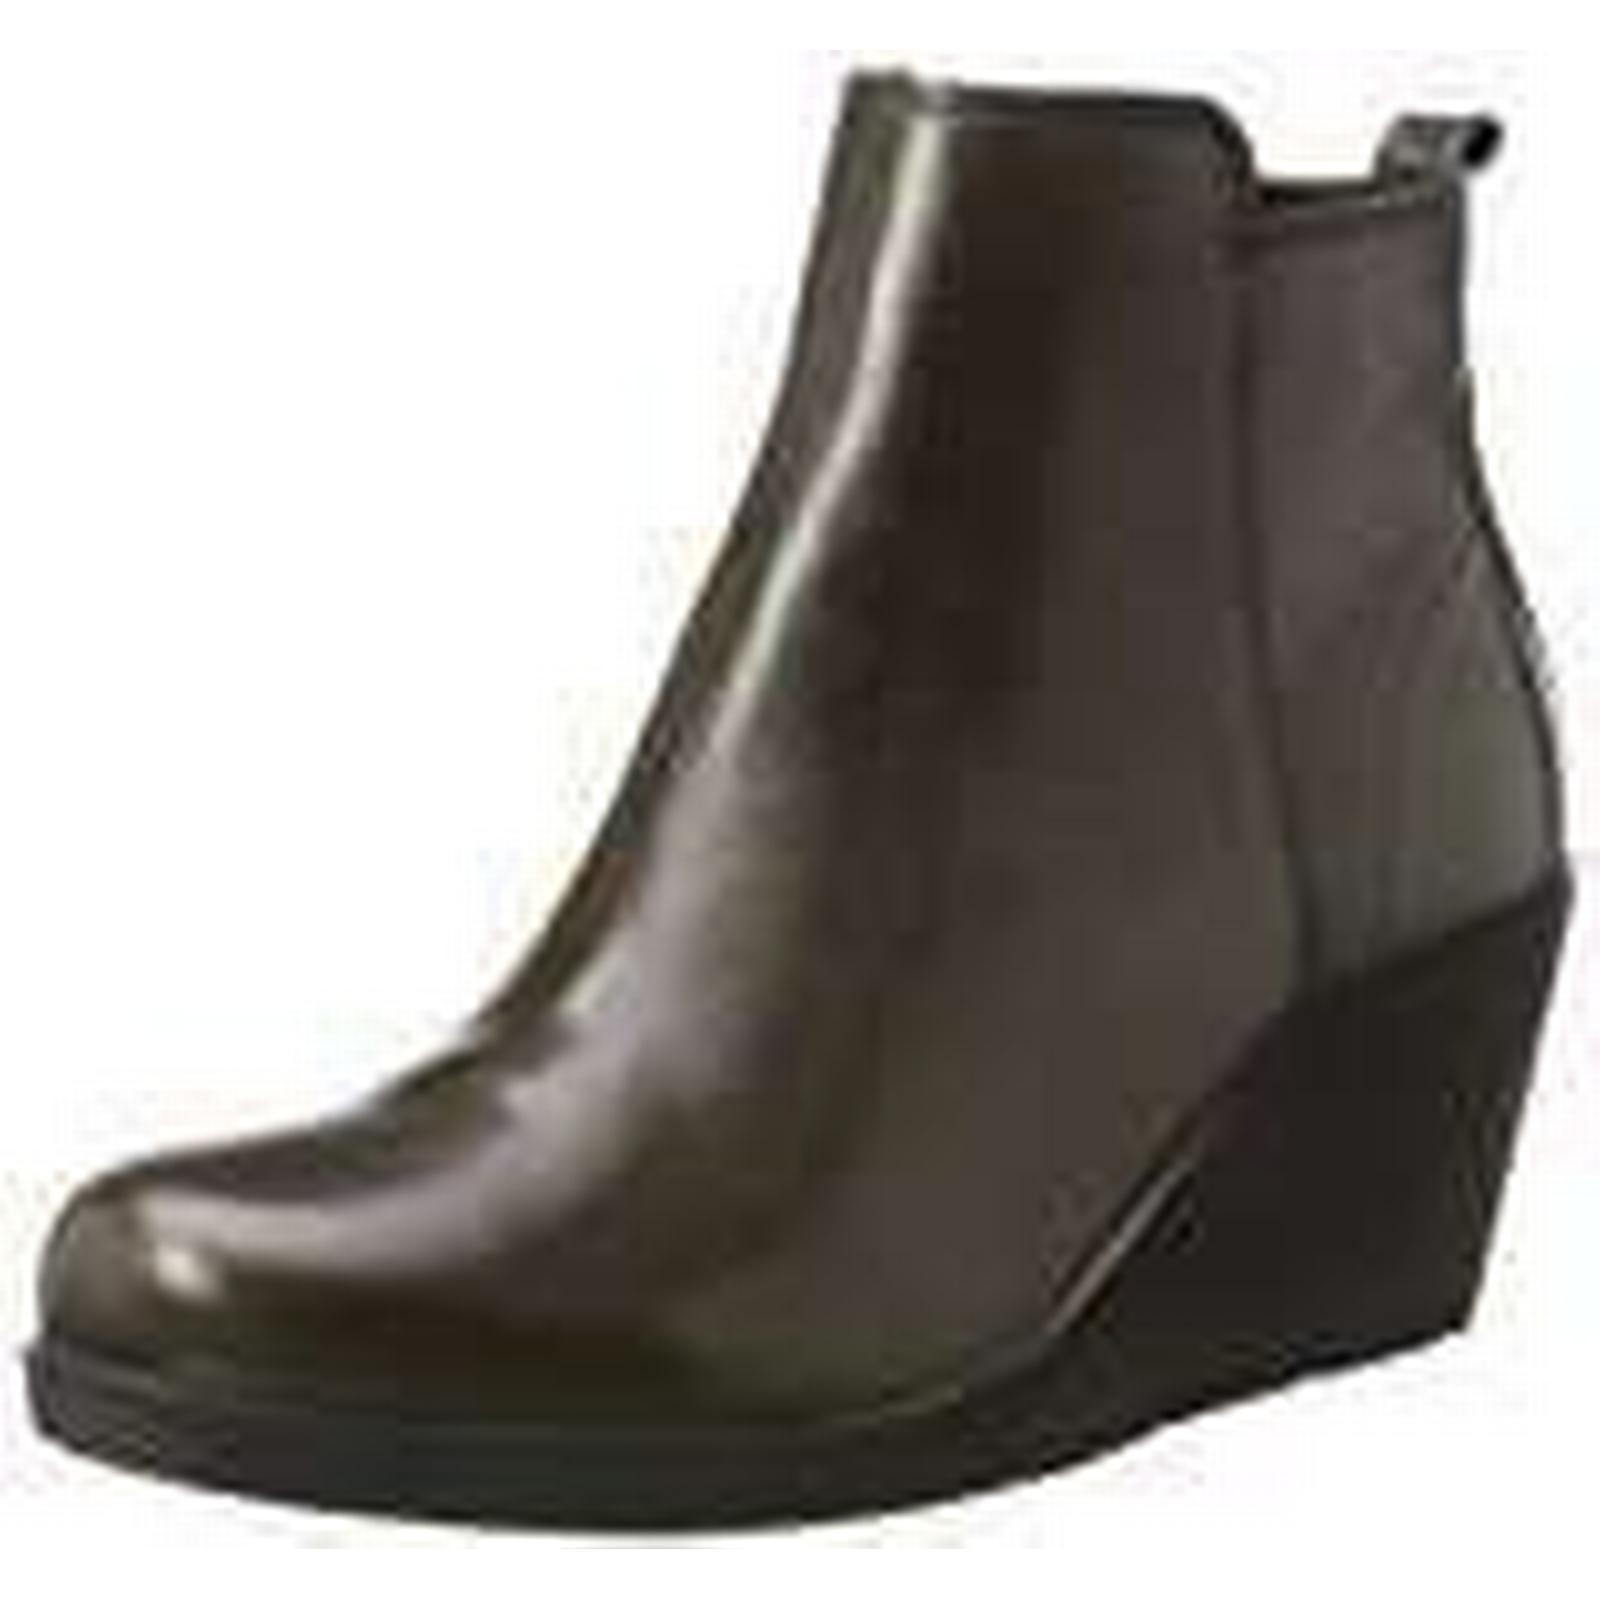 ECCO Women's Bella 1543), Wedge Boots, Green (Tarmac 1543), Bella 7 UK 7 UK 648808